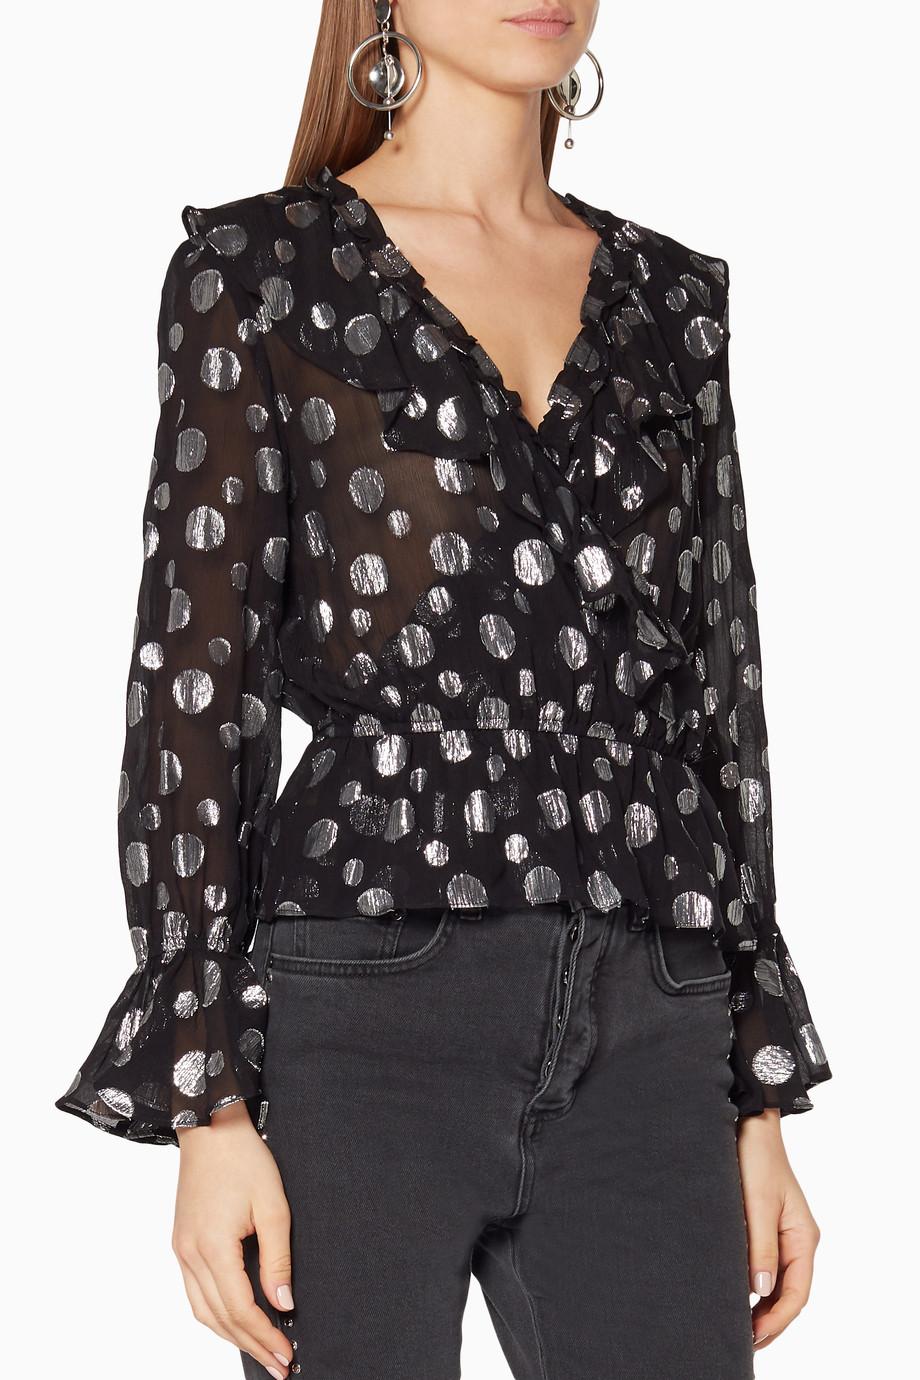 fd70a673104aad Shop RIXO Black Black Lamé Spot Roisin Top for Women | Ounass UAE